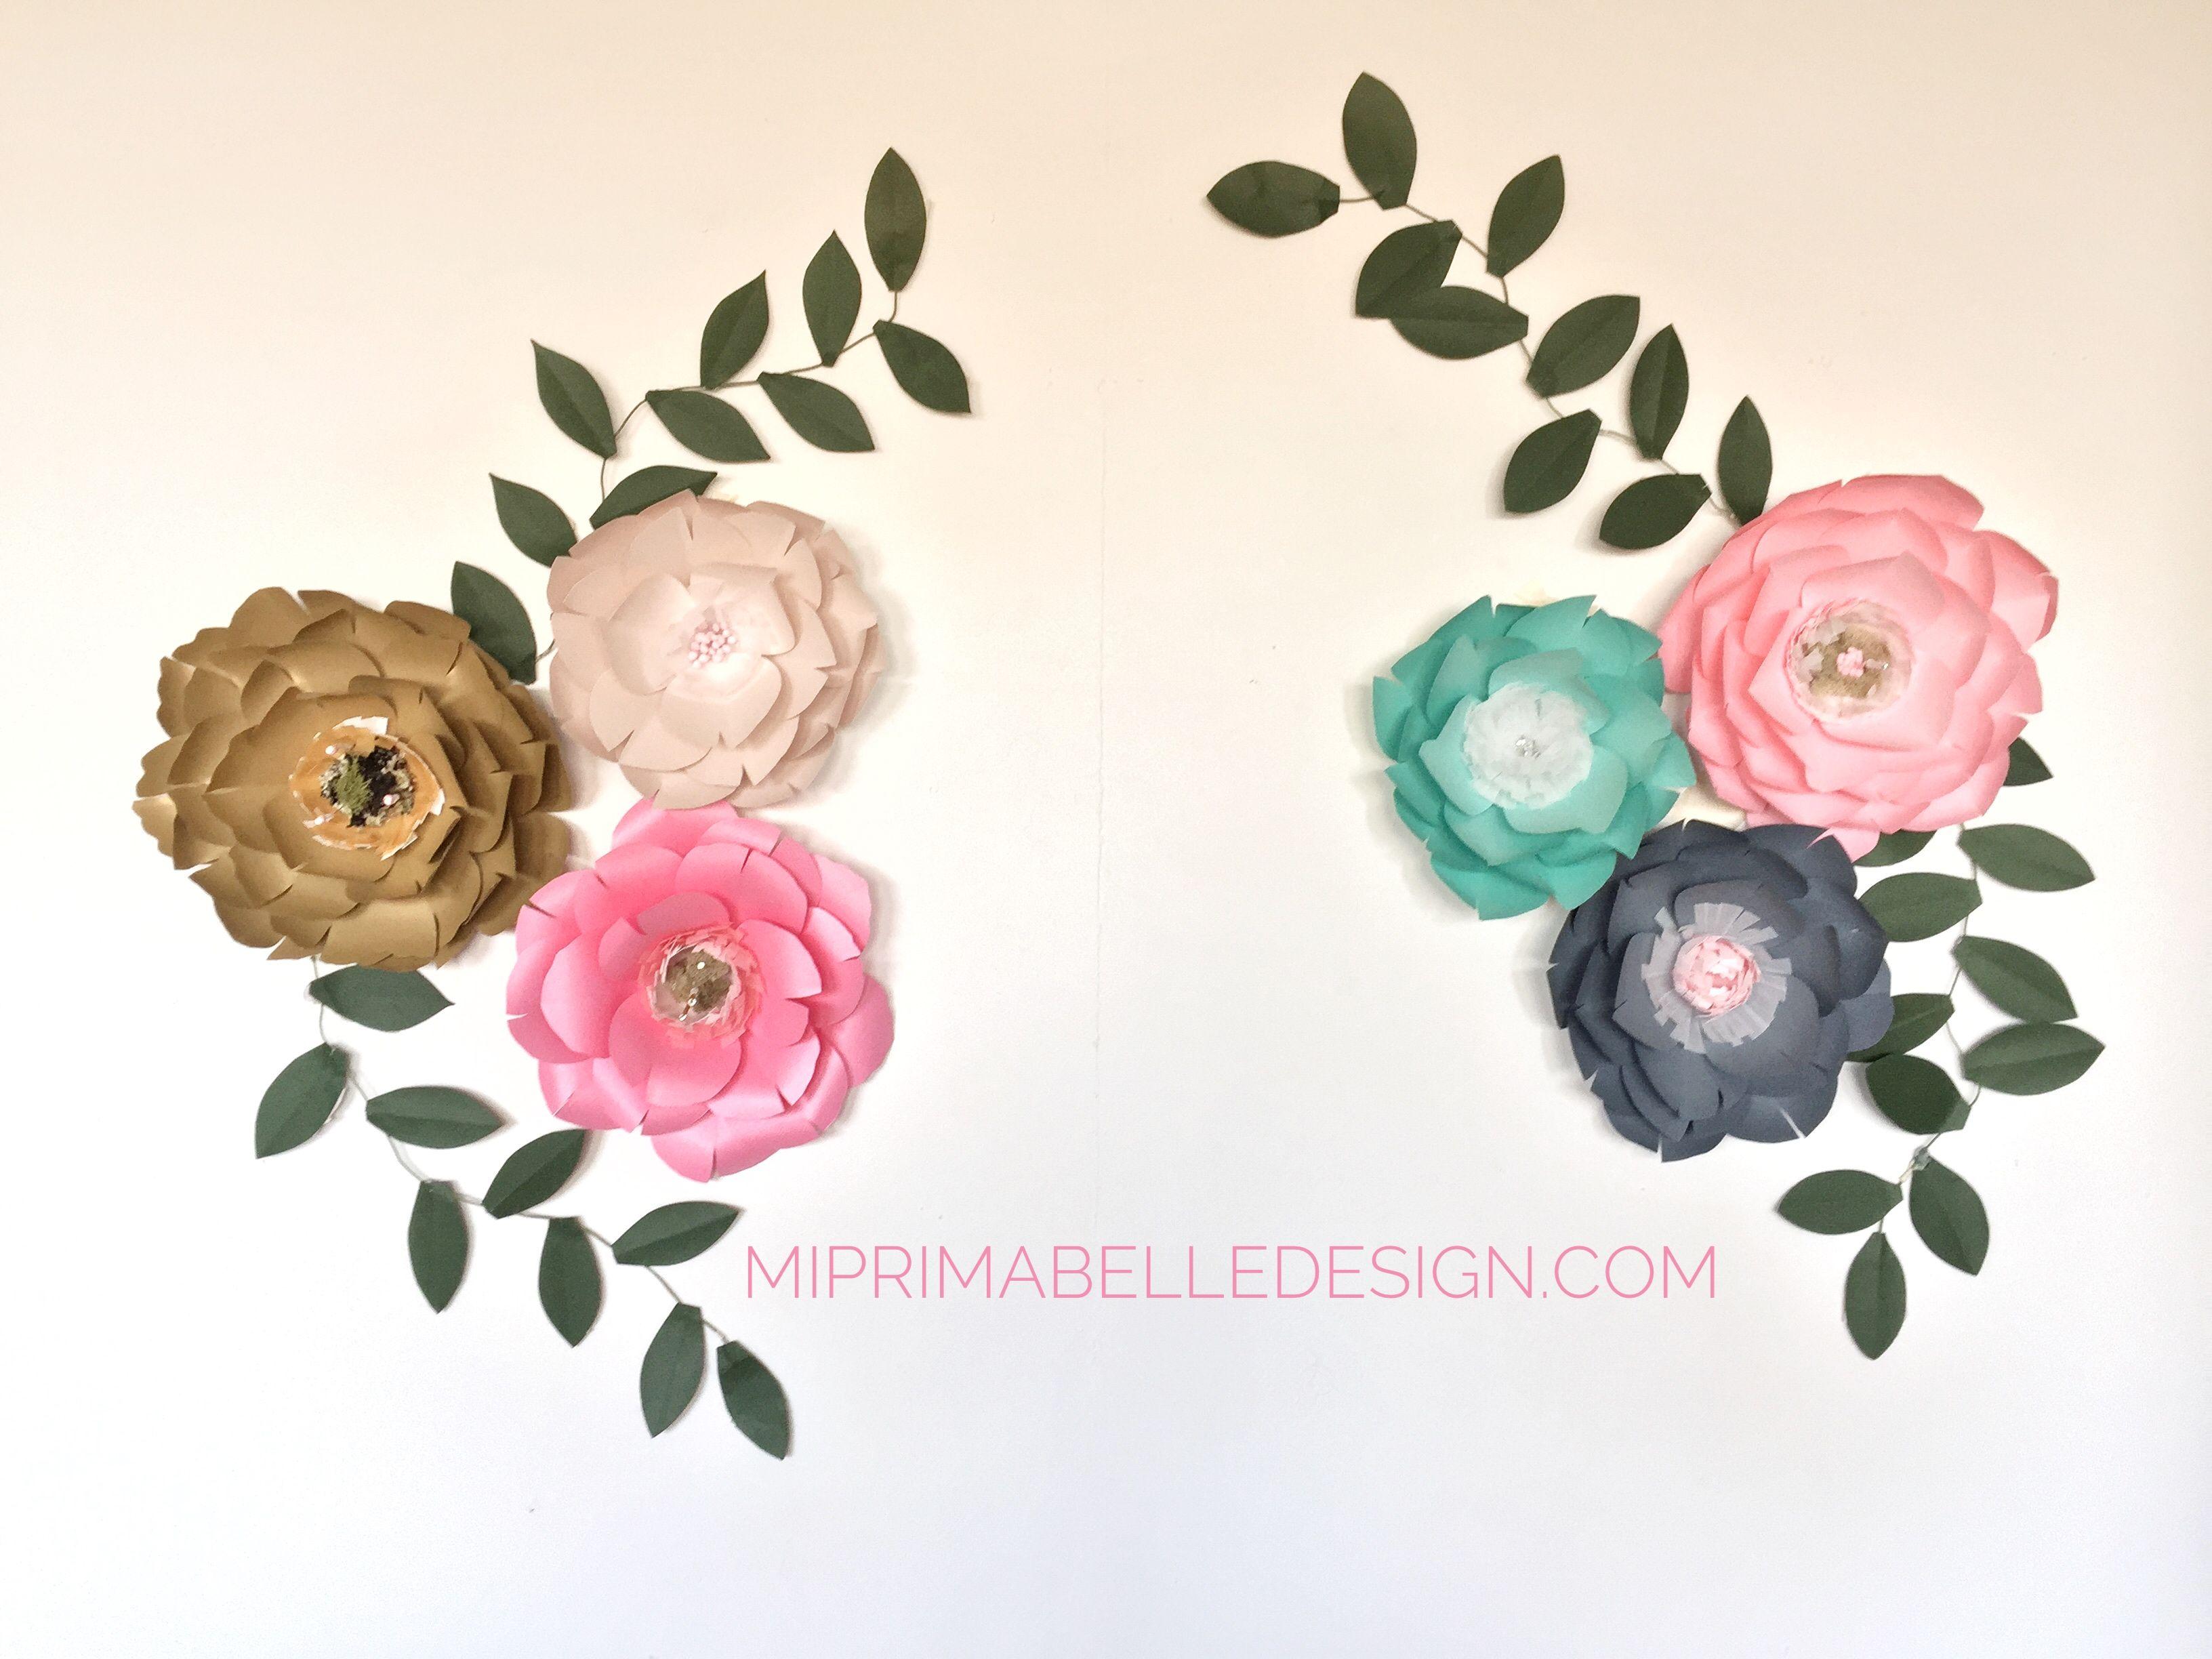 Mi Prima Belle Sells Paper Flowers On Etsy Gorgeous Paper Flowers